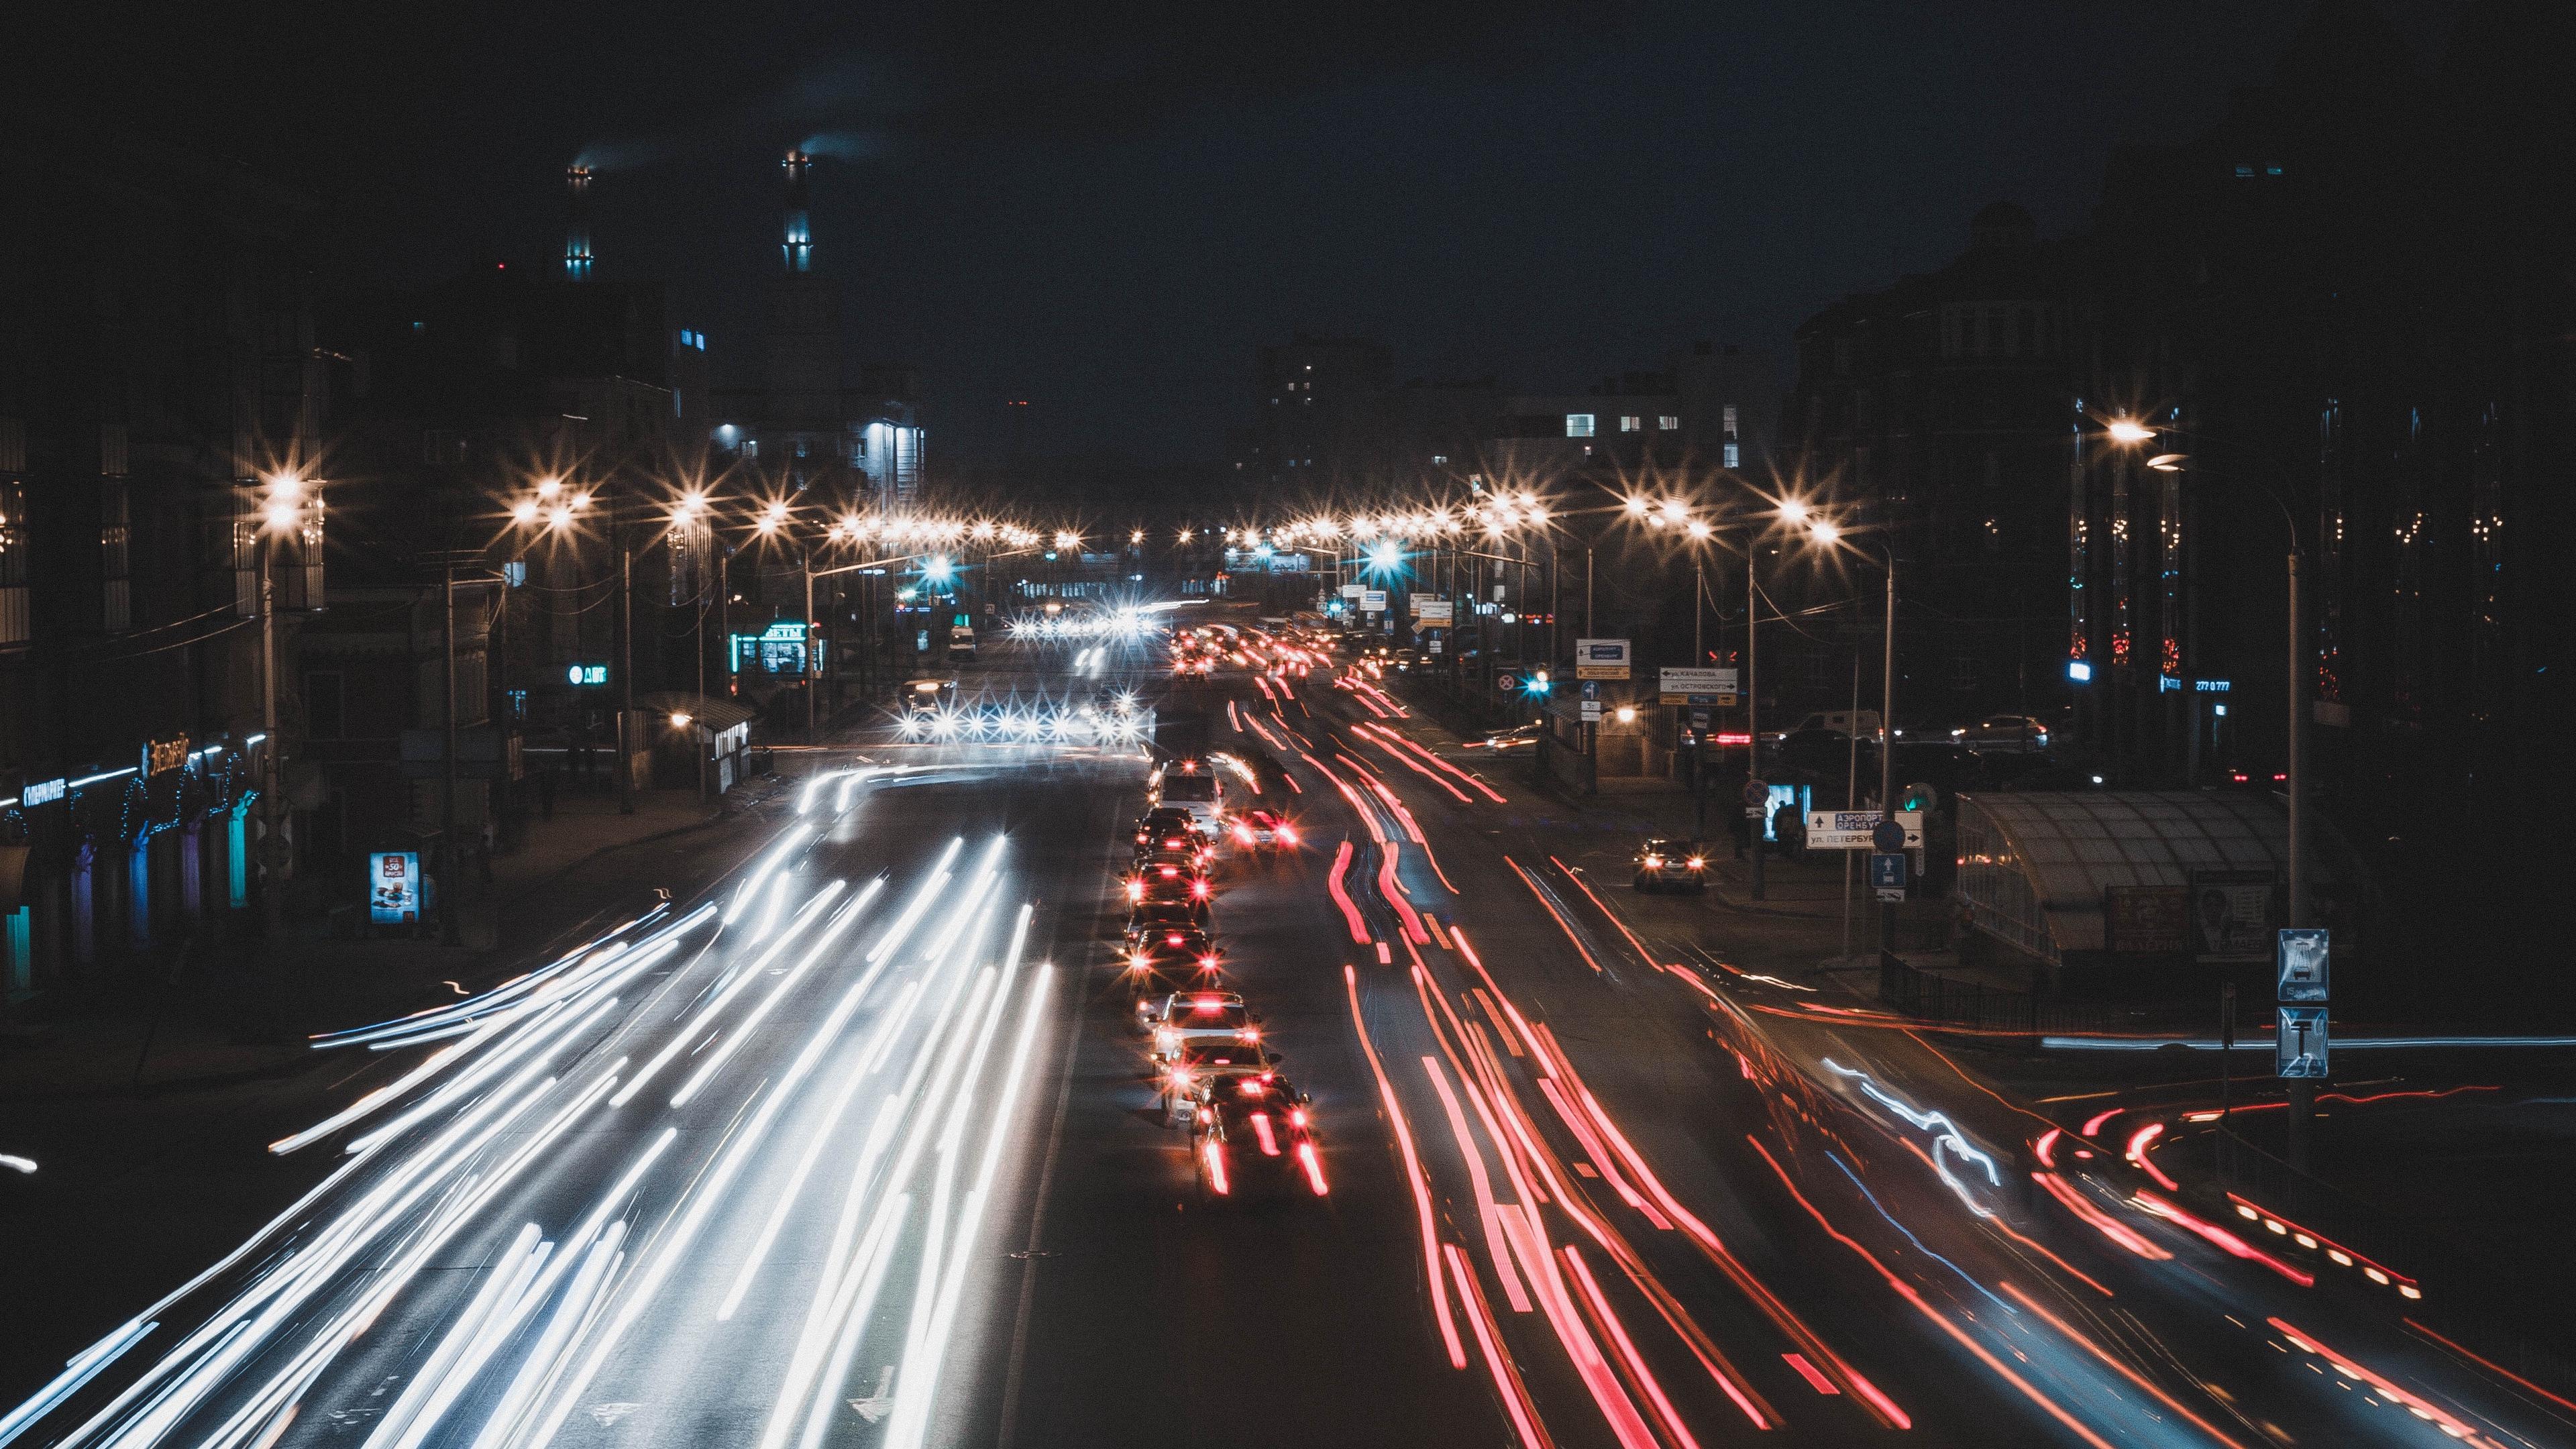 night city traffic road 4k 1538065062 - night city, traffic, road 4k - Traffic, Road, night city